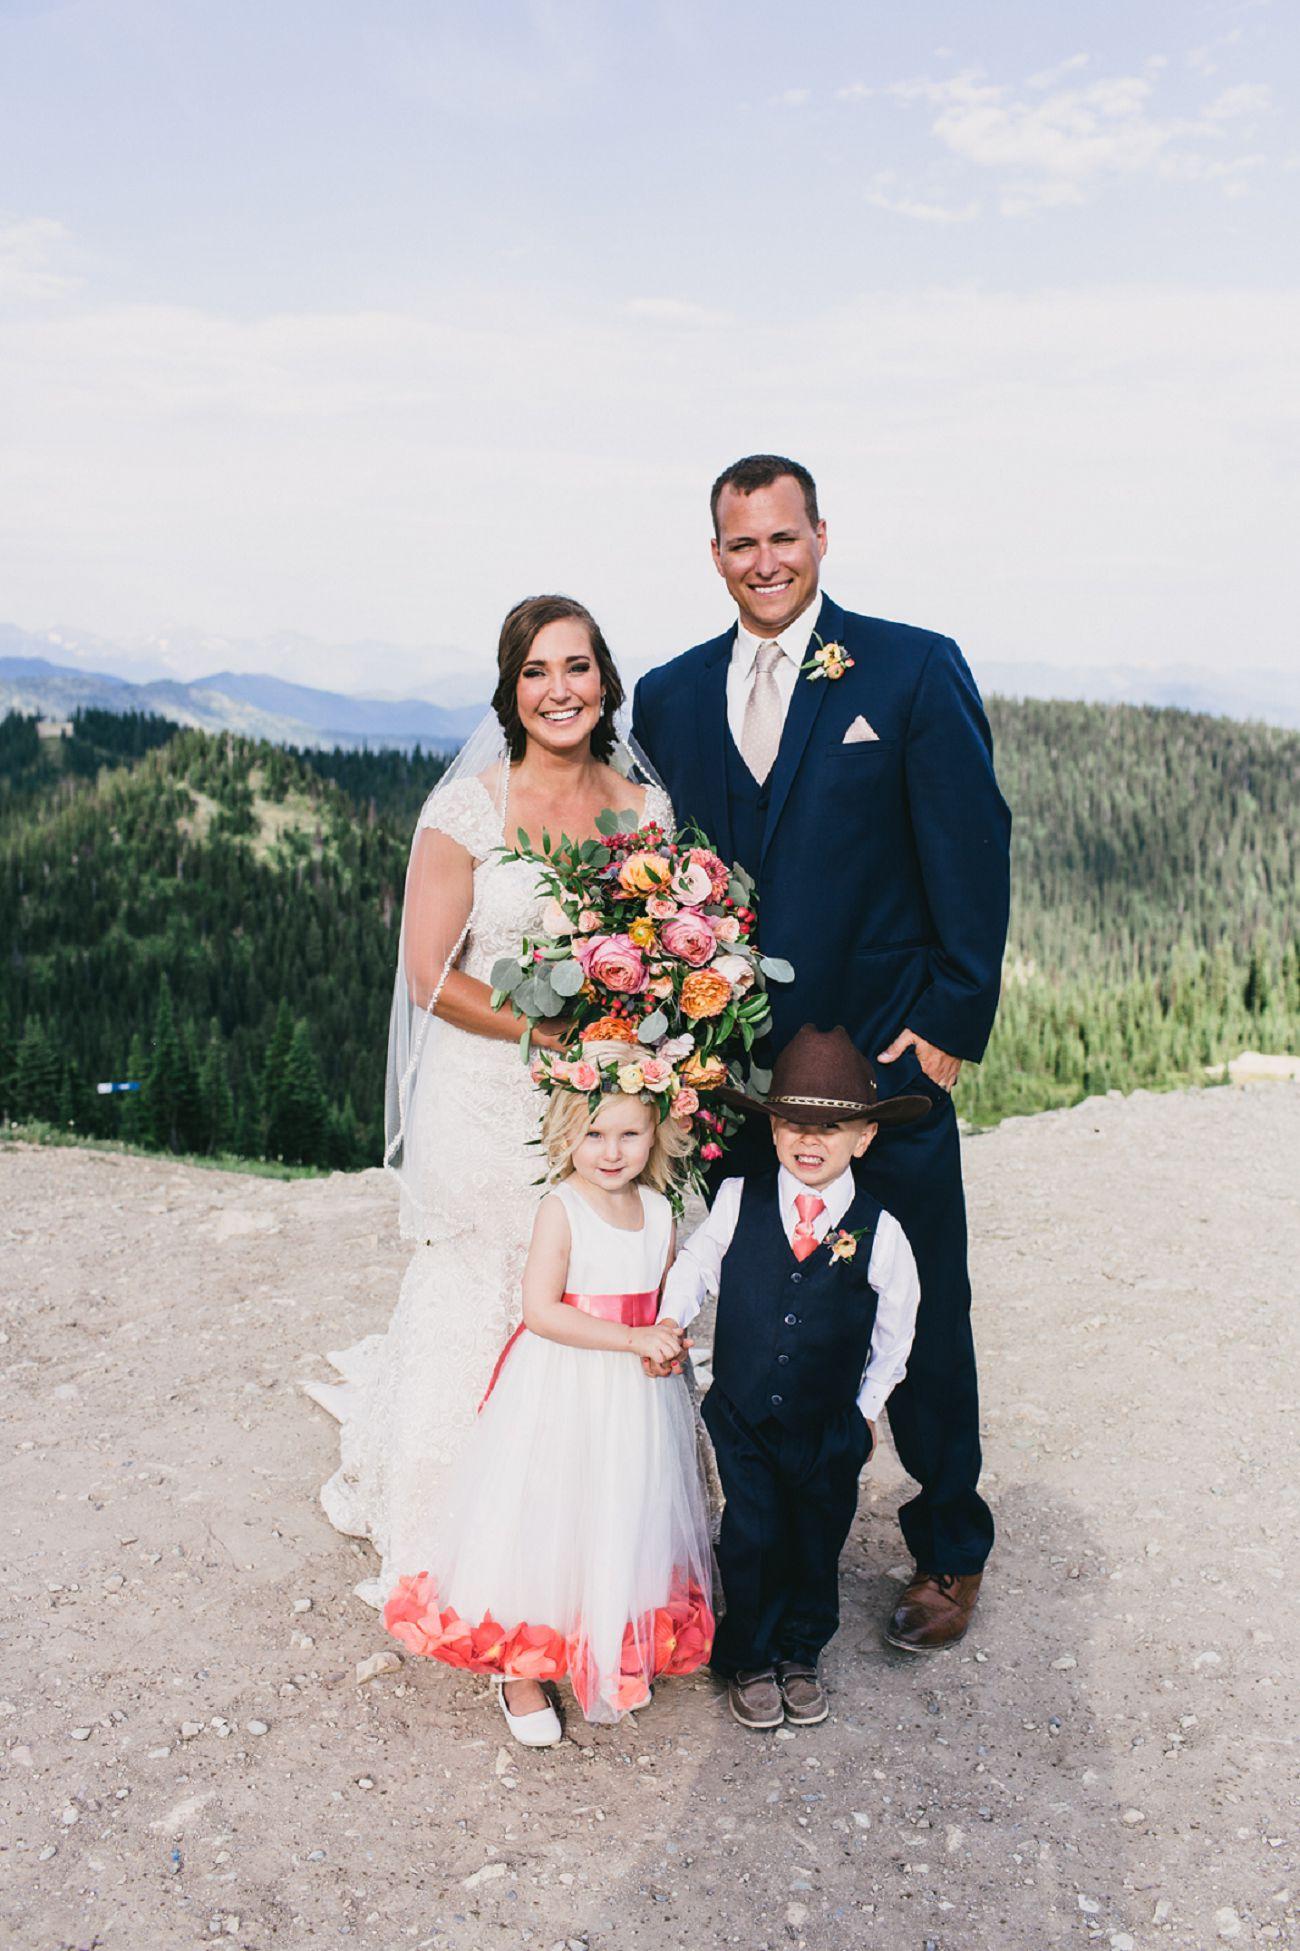 Jennifer_Mooney_Photo_Whitefish_Mountain_Resort_Wedding_00081.jpg